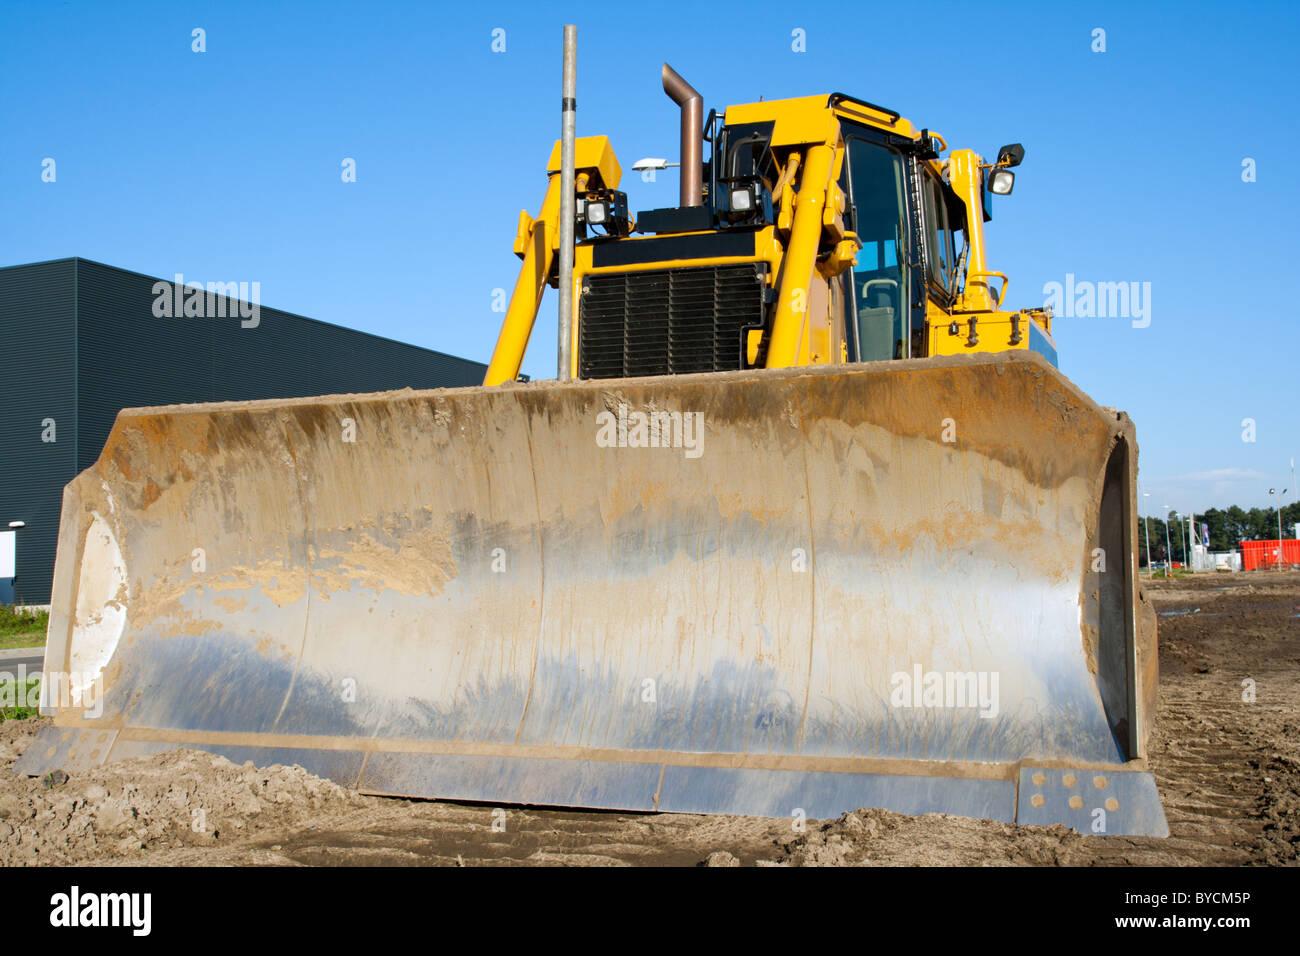 Yellow bulldozer at work - Stock Image